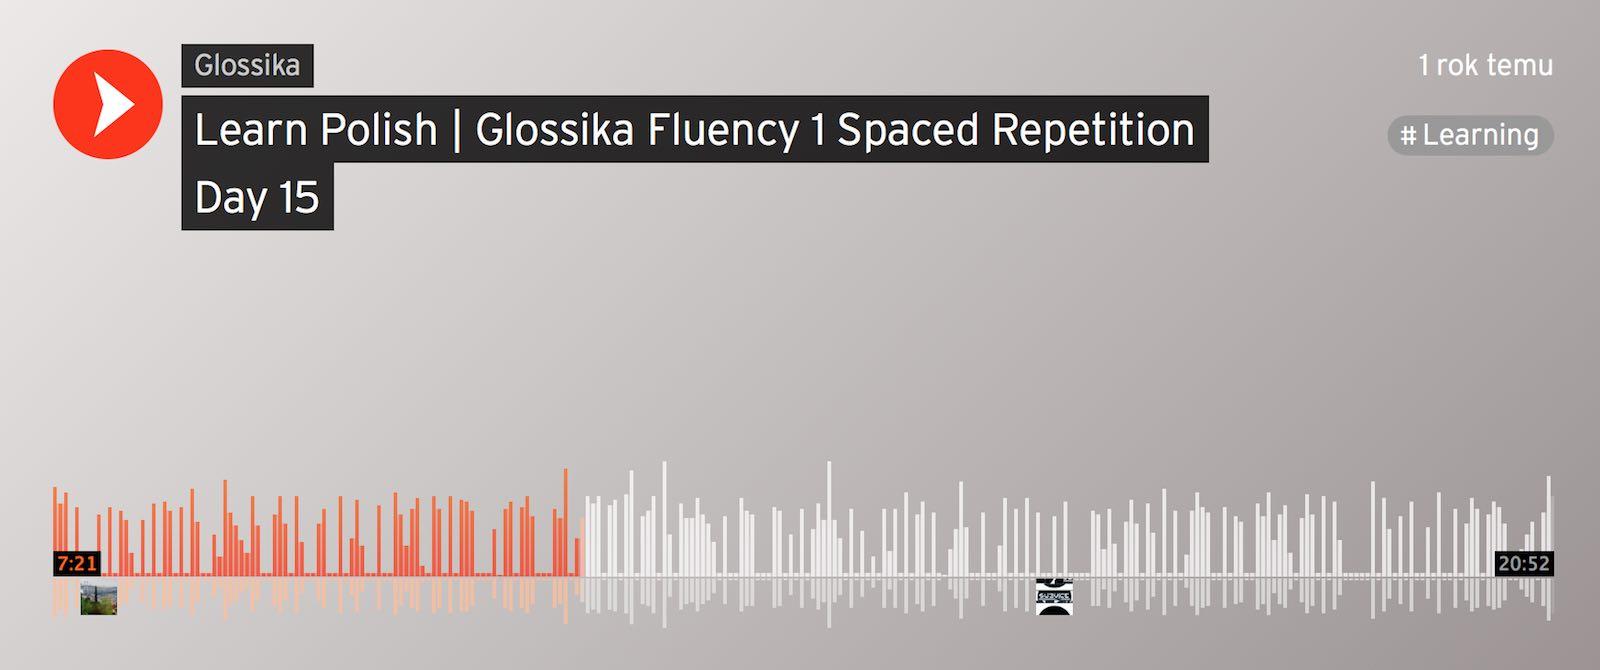 how-to-pronounce-krakow-glossika